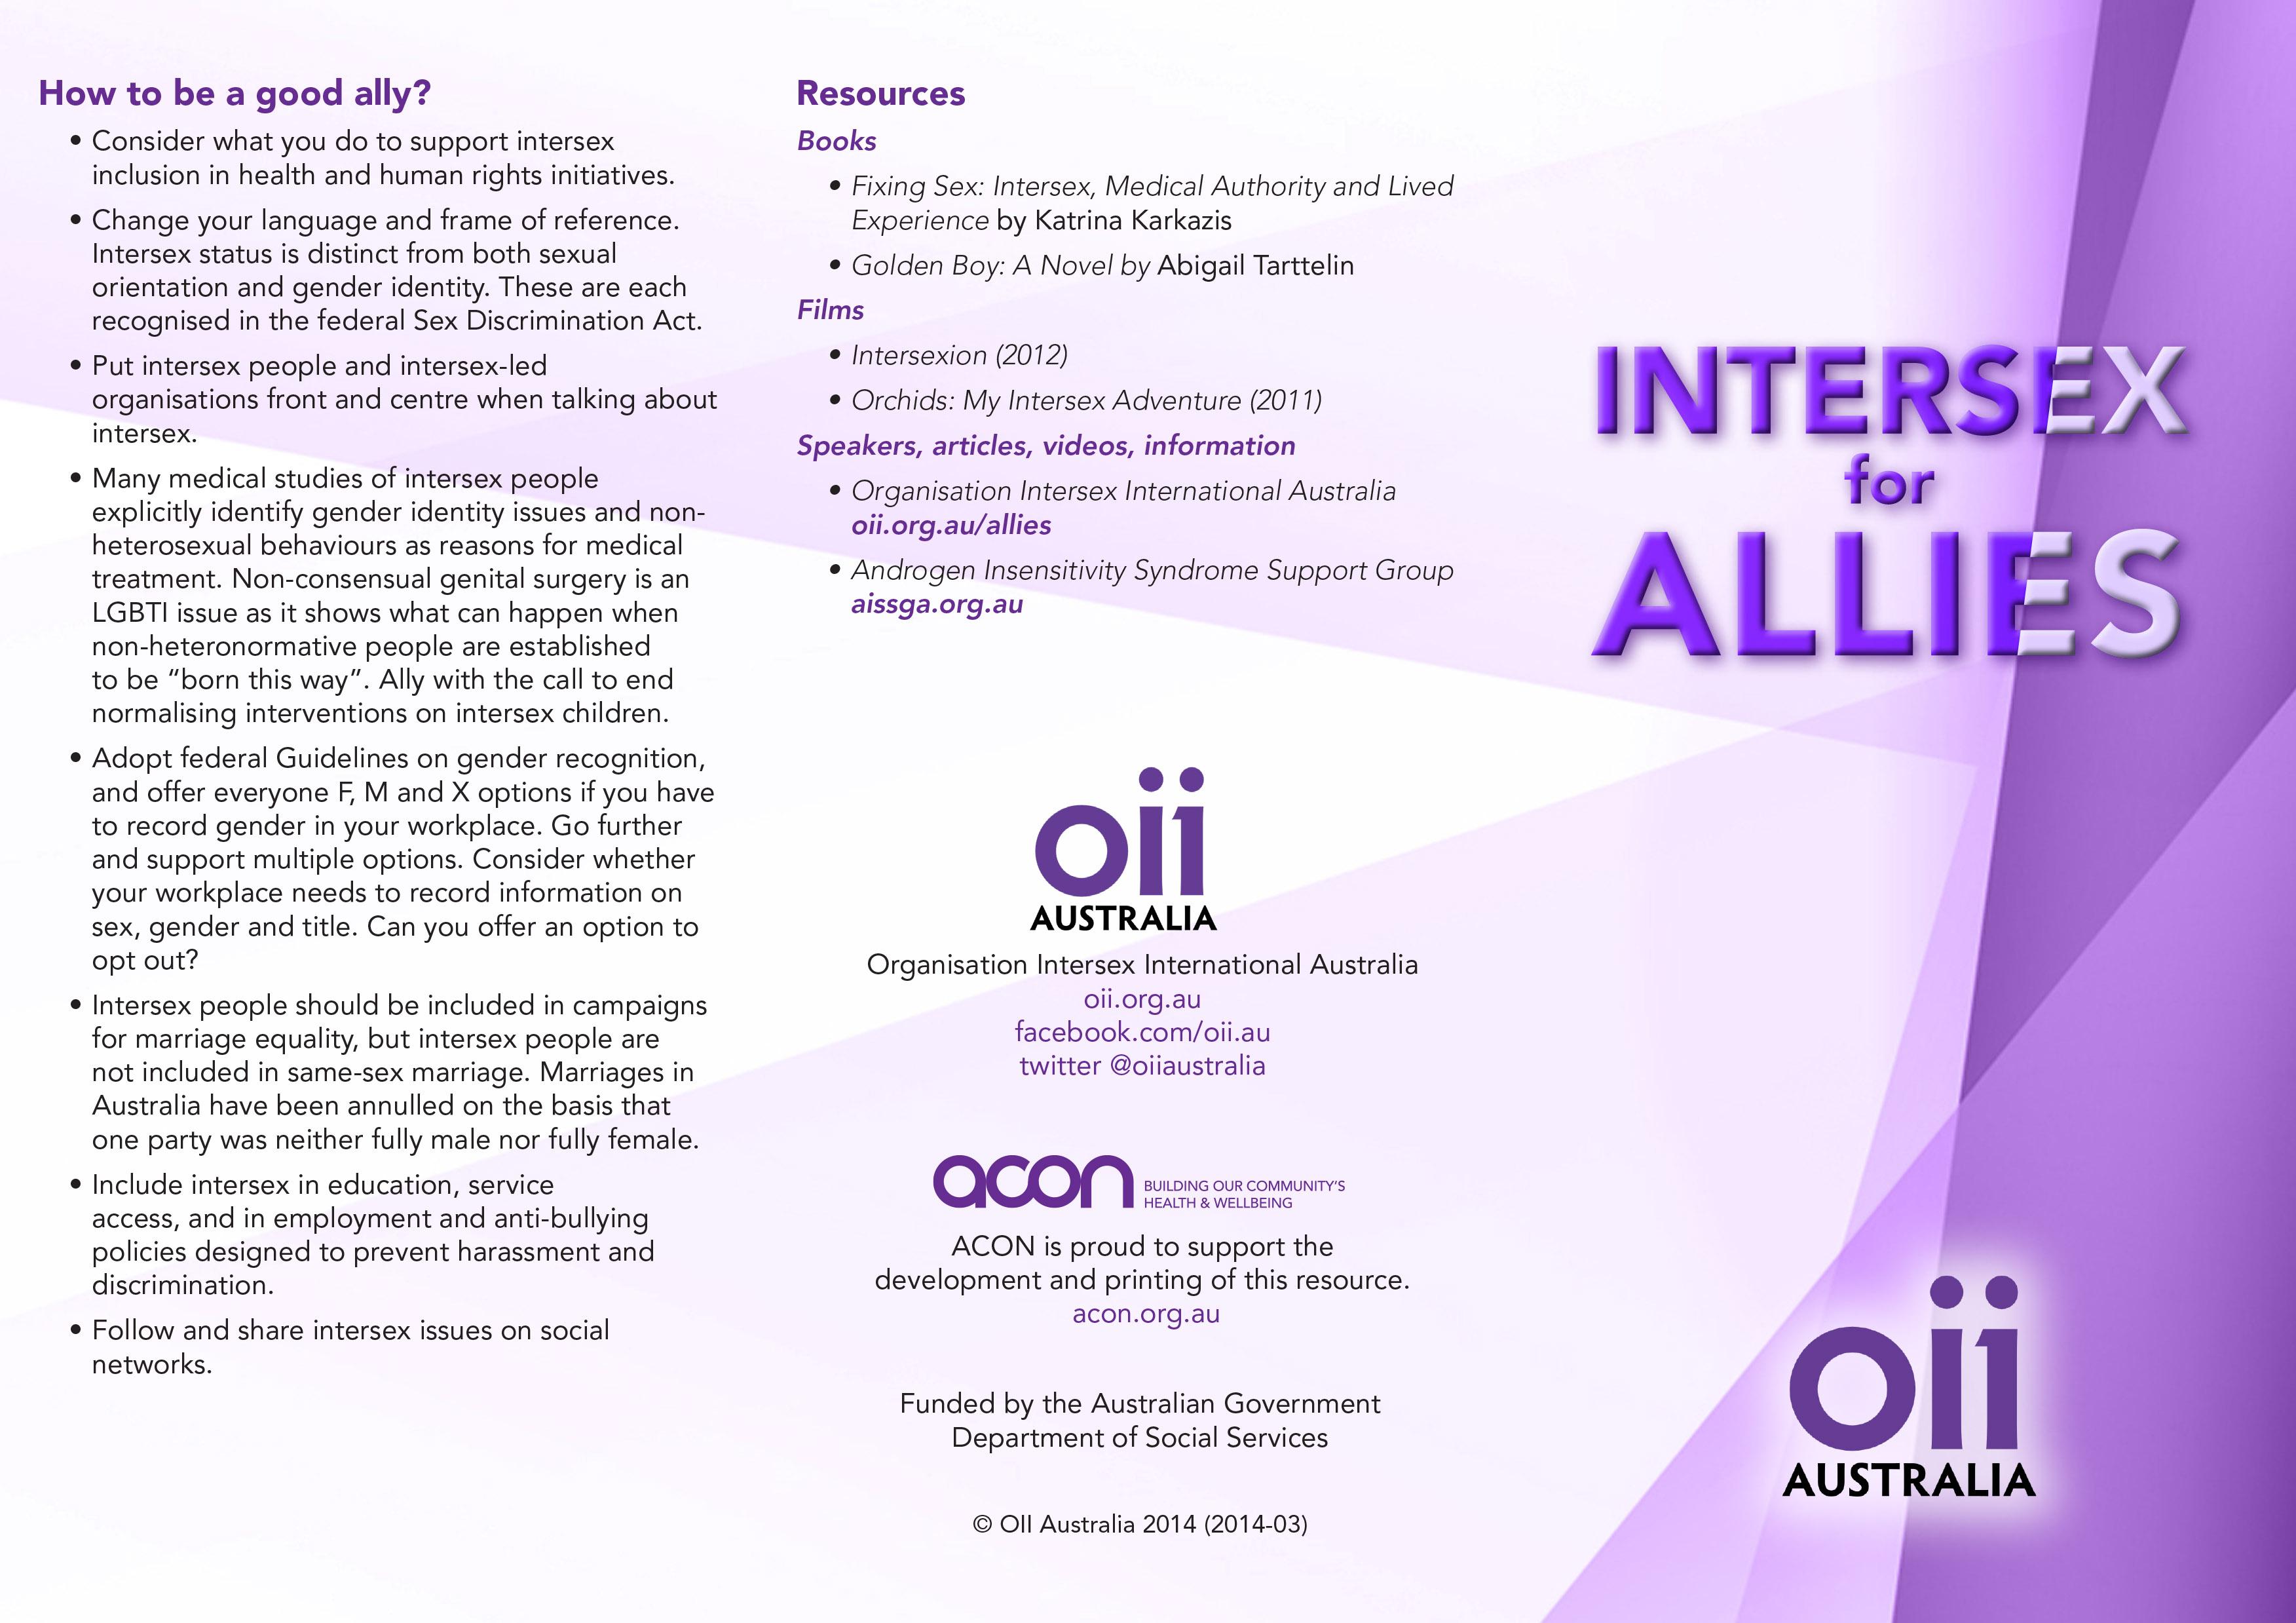 Information on intersexuals